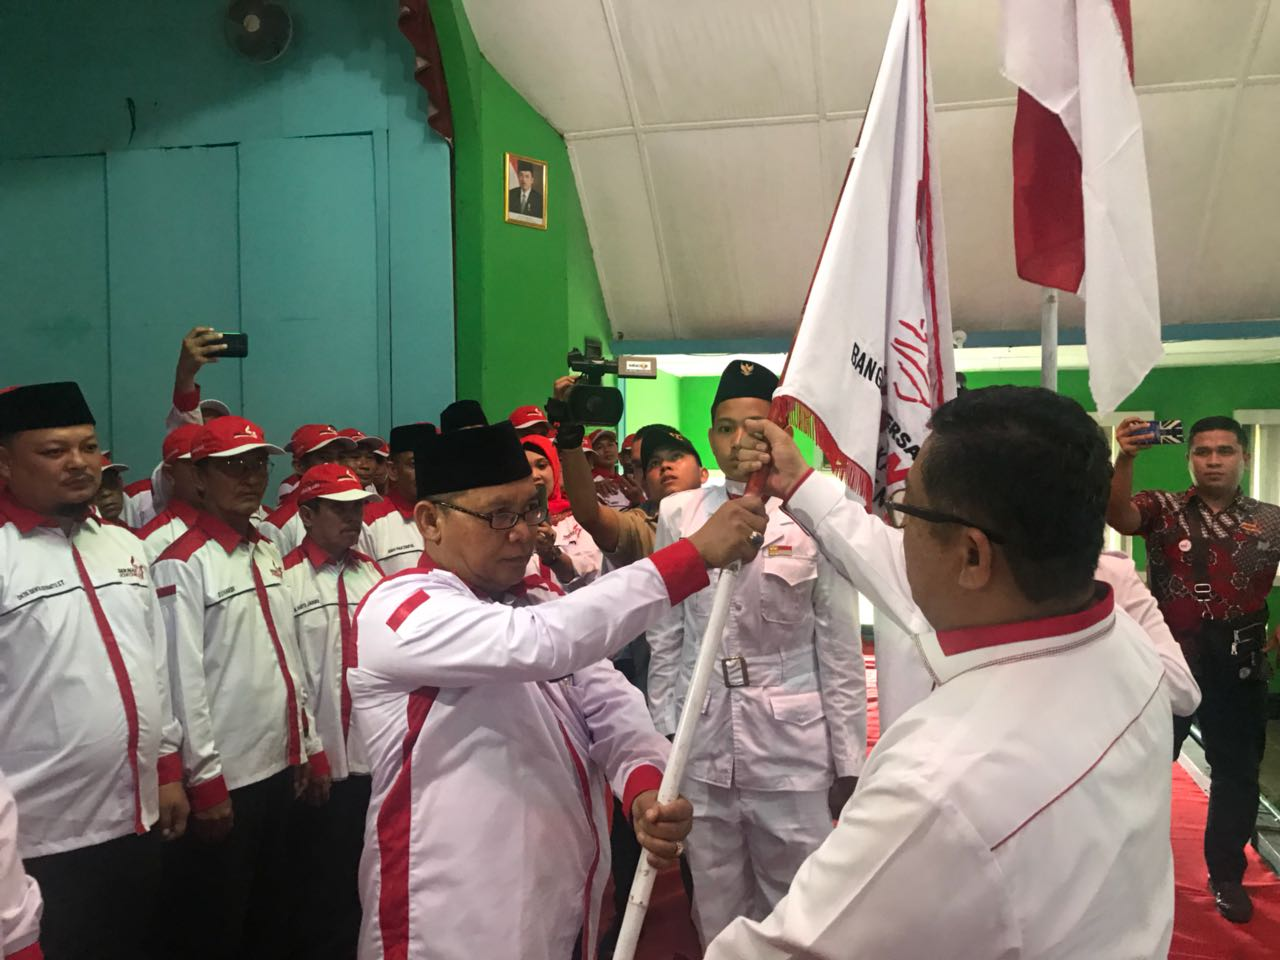 Seknas Jokowi Deklarasikan Lagi  Gerakan Nasional Jokowi 2 Periode di PALI